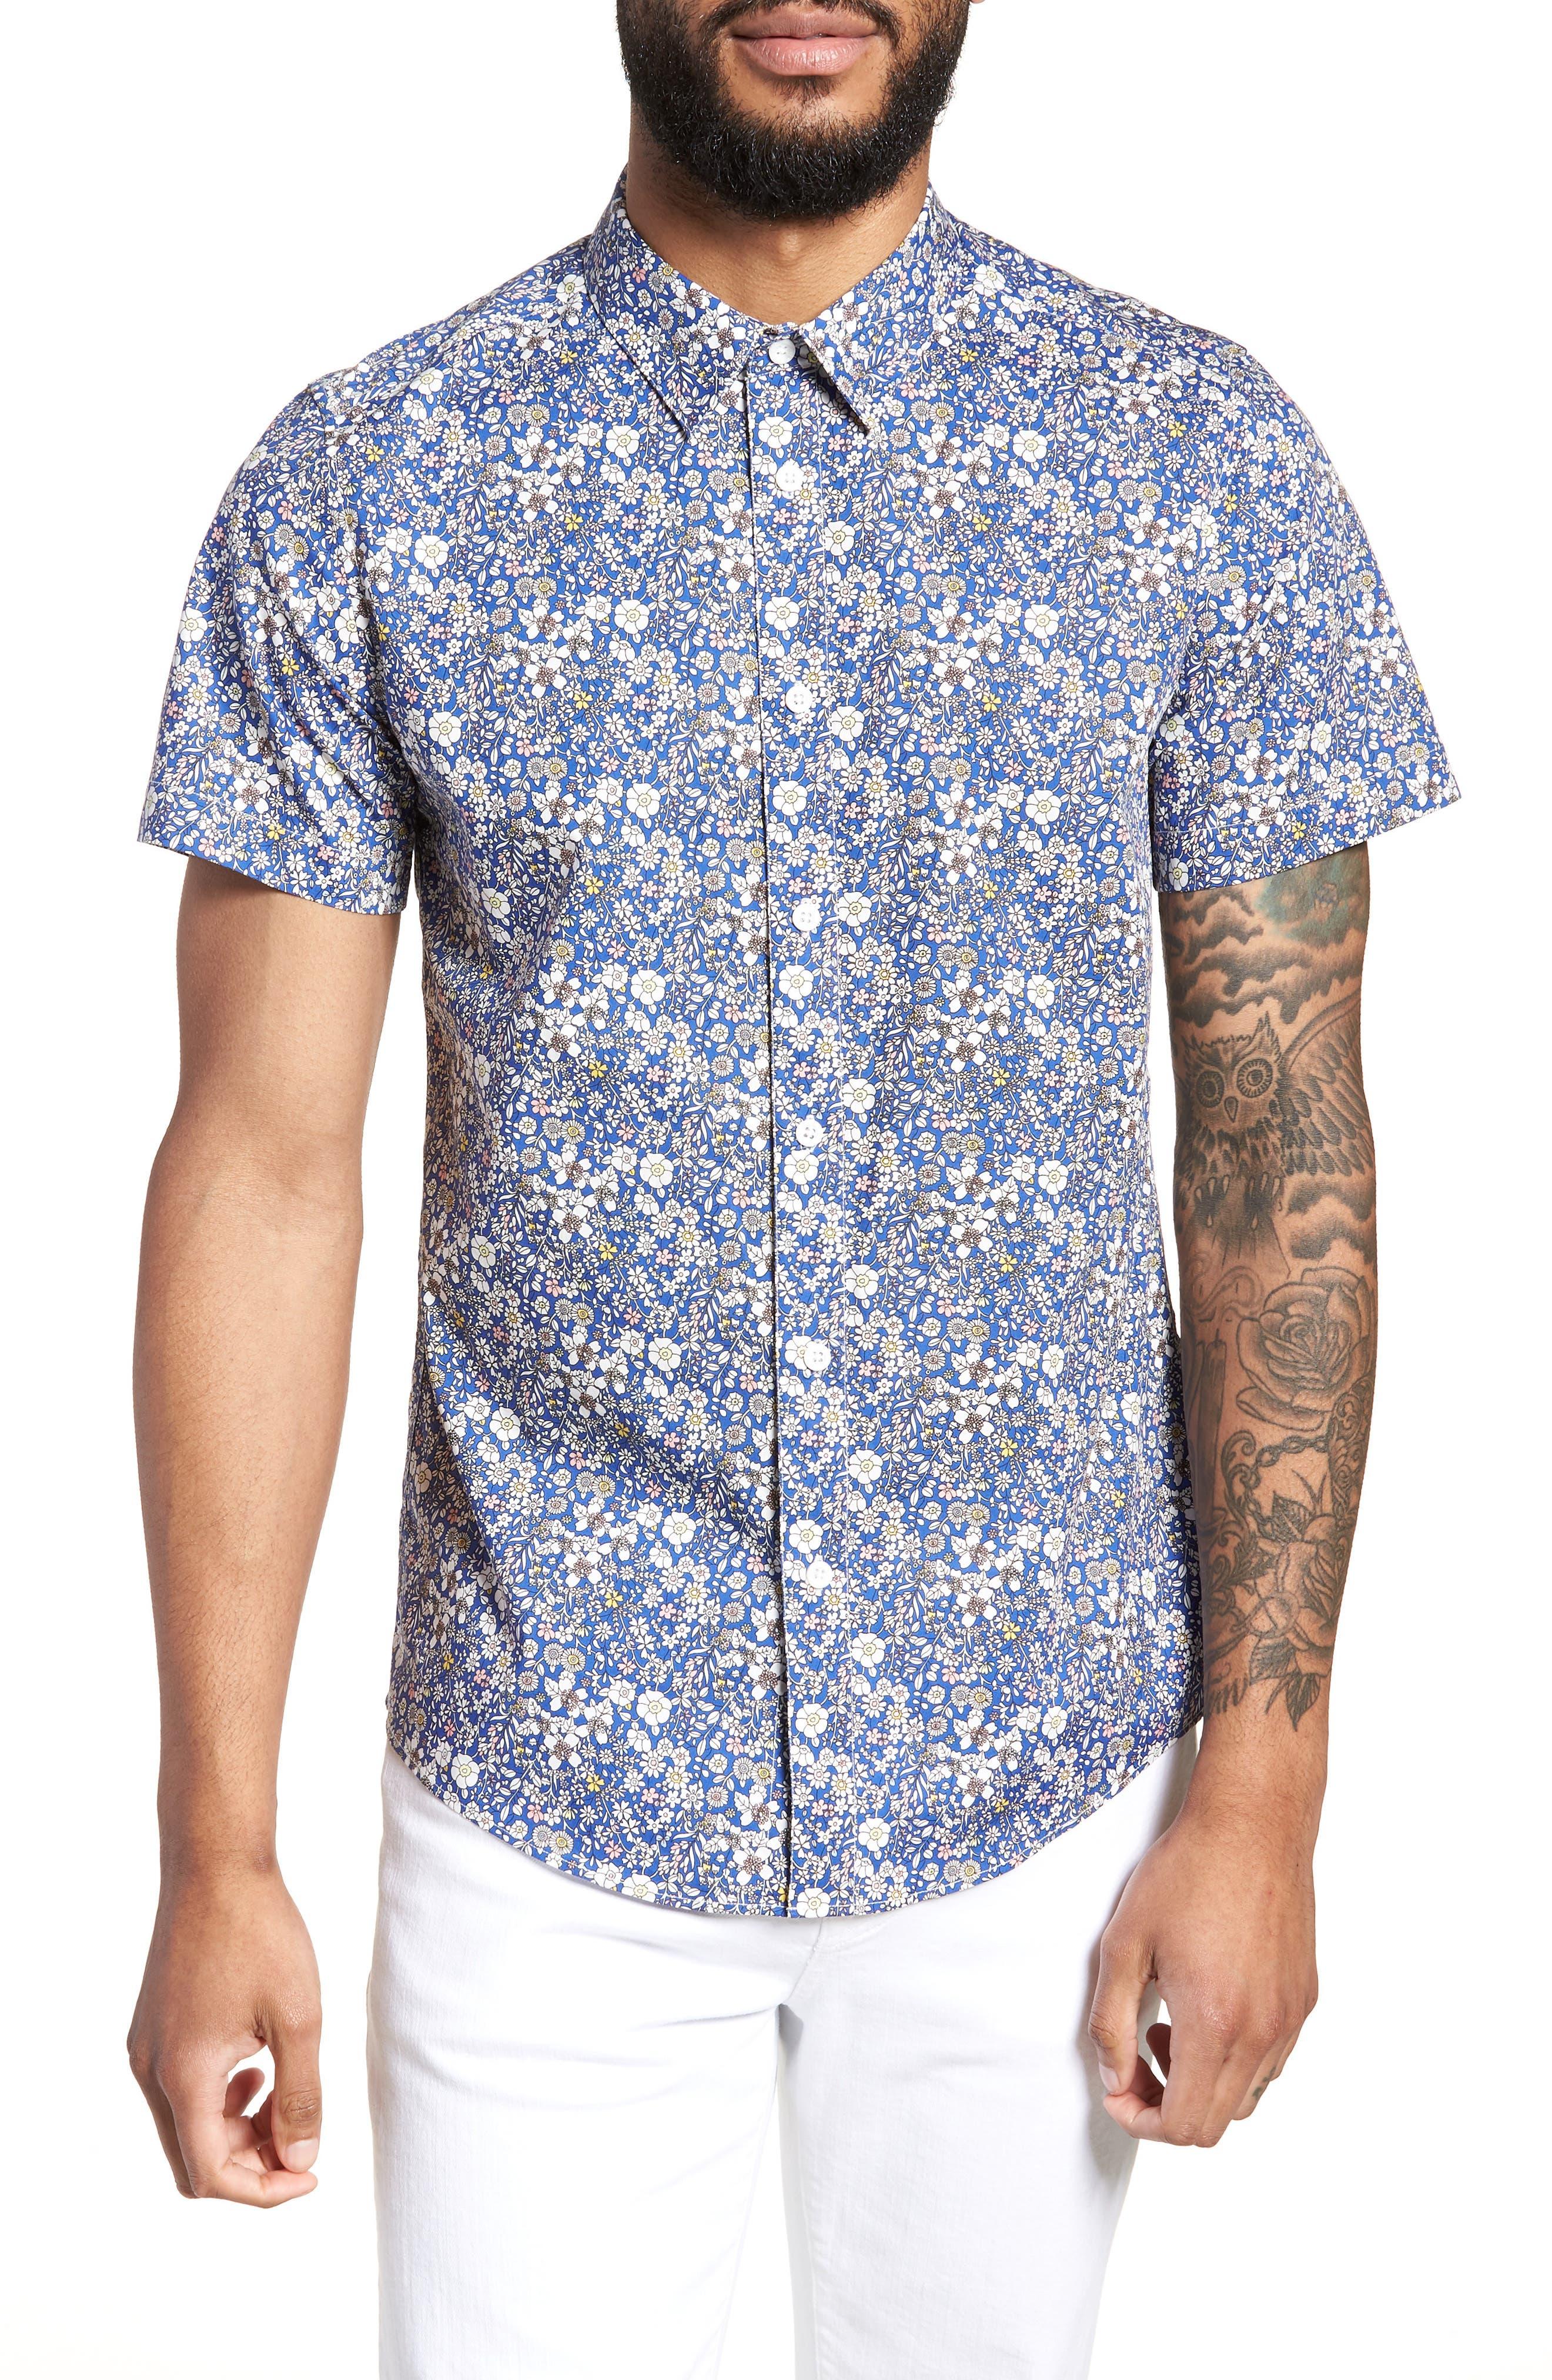 Trim Fit Print Woven Short Sleeve Shirt,                         Main,                         color, Blue Pink Floral